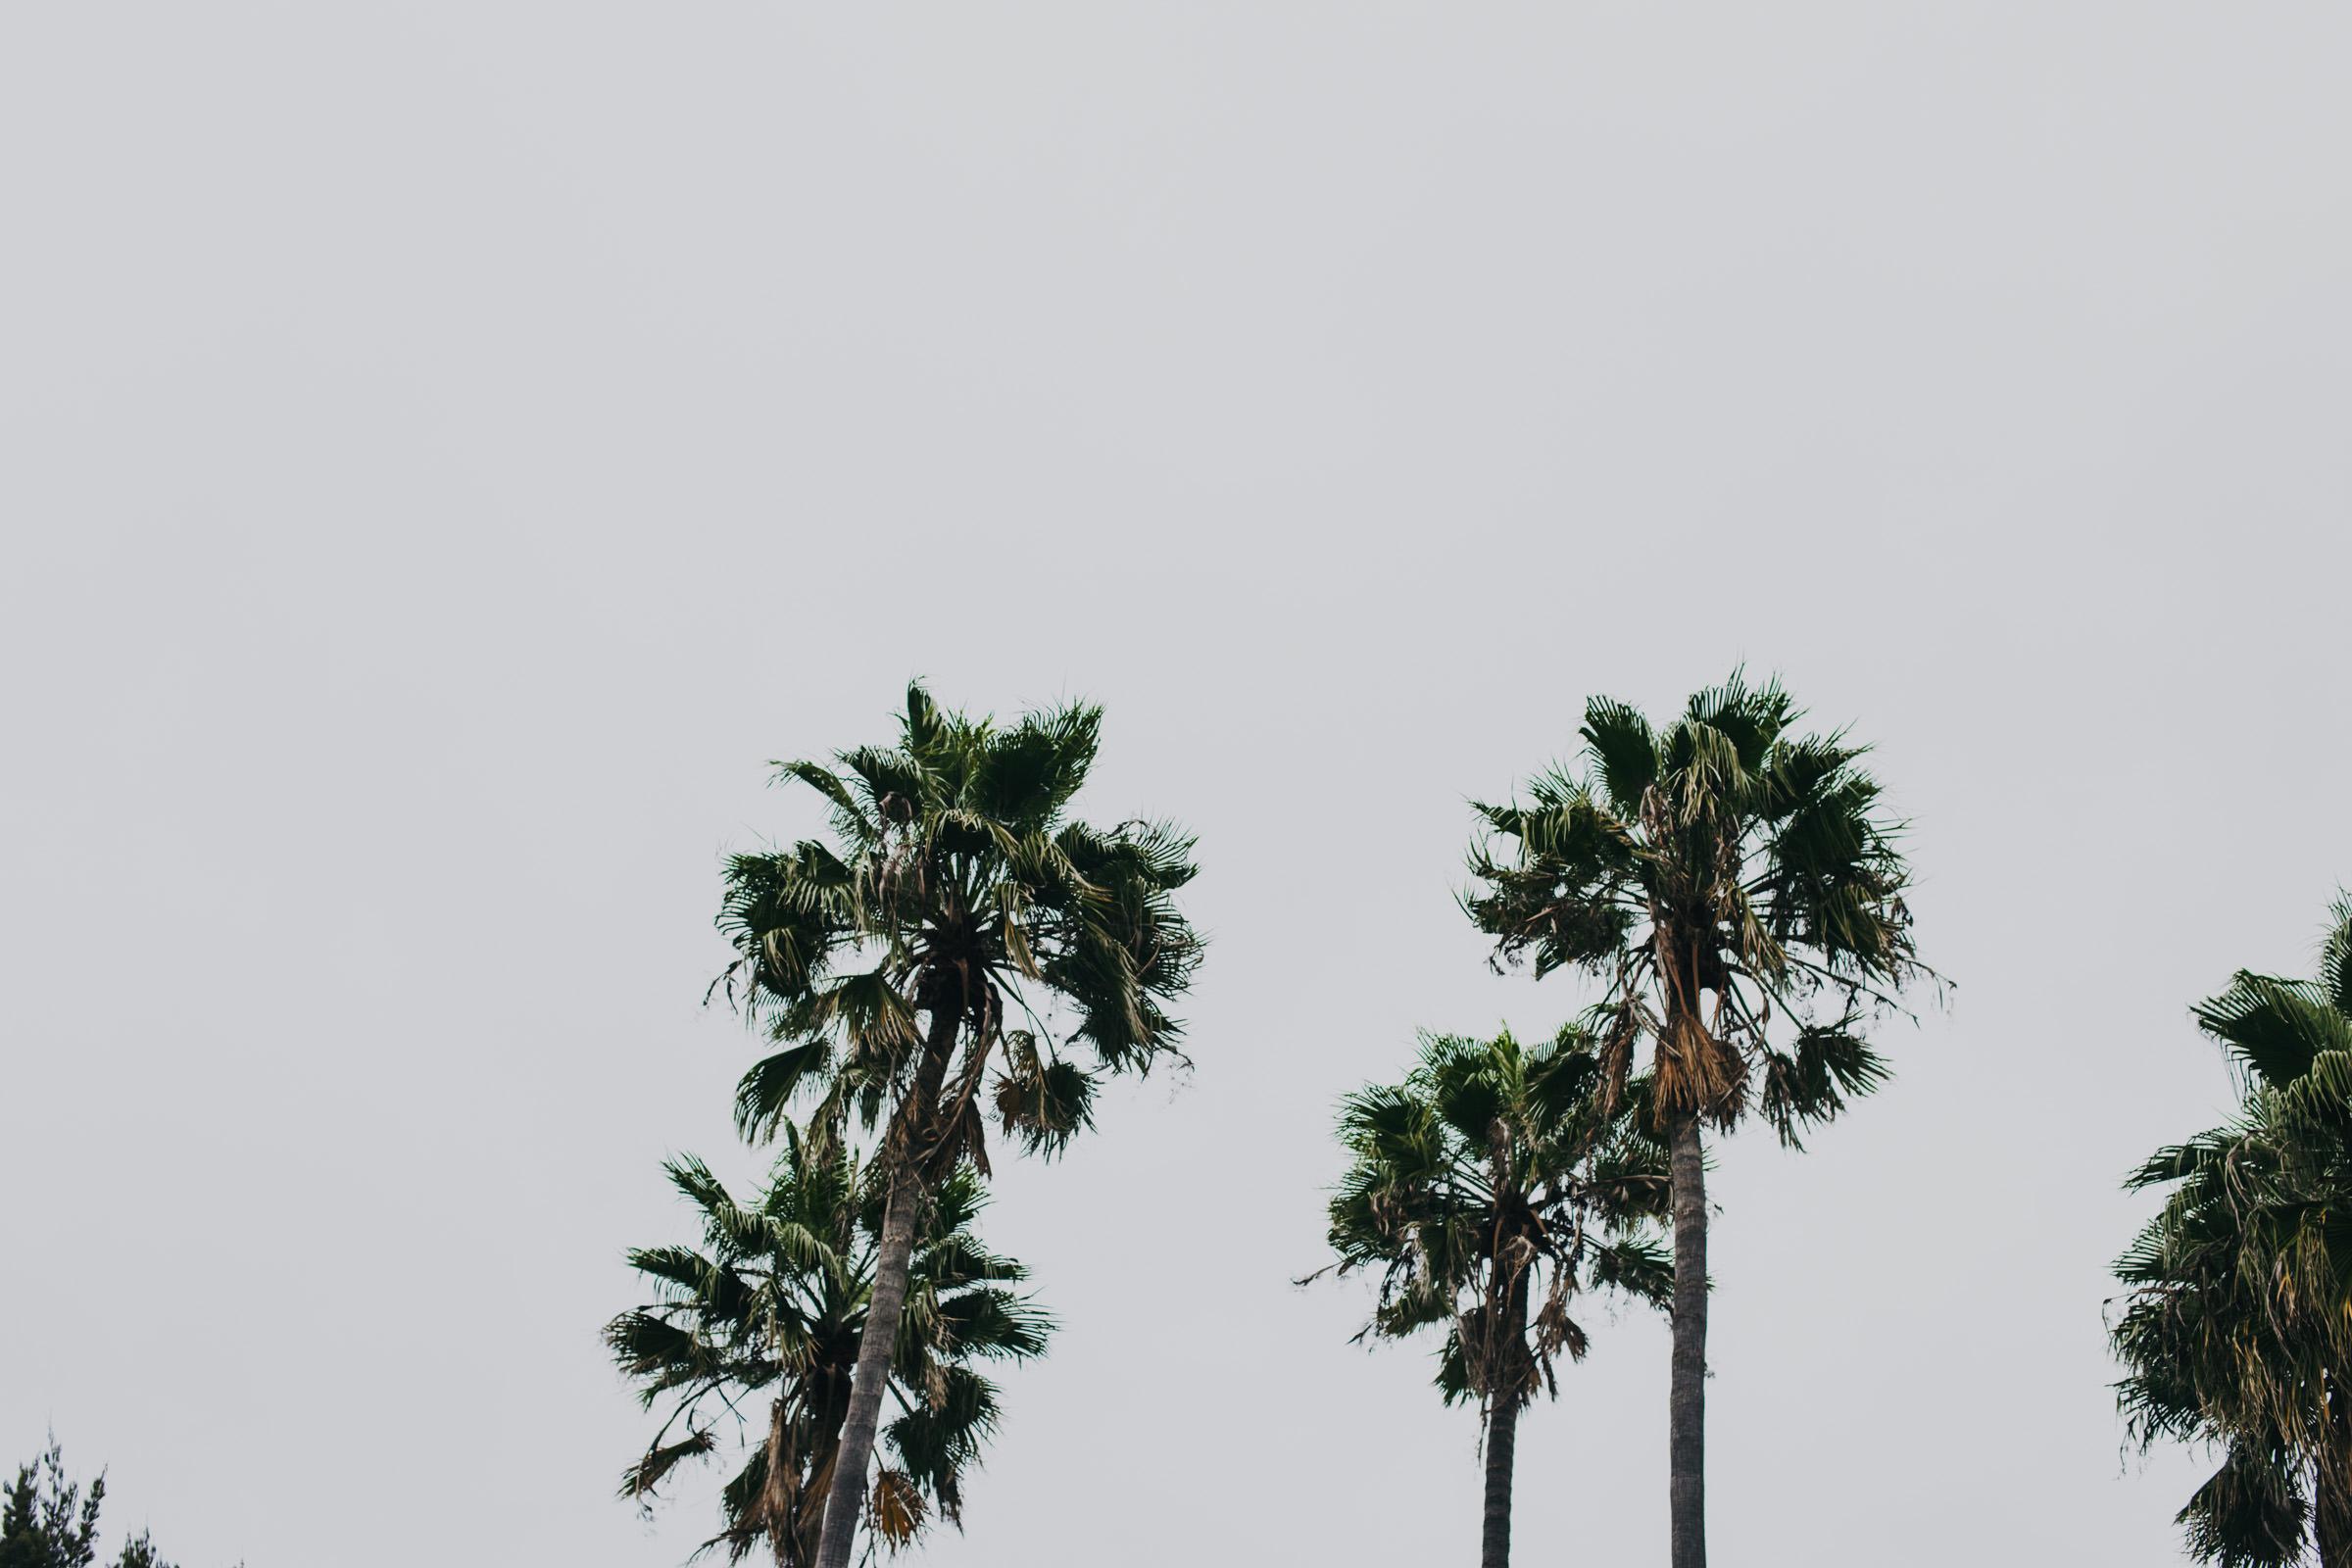 Boda-Celaya-Hacienda-Mexico-Fotografia-Pierce--33.jpg